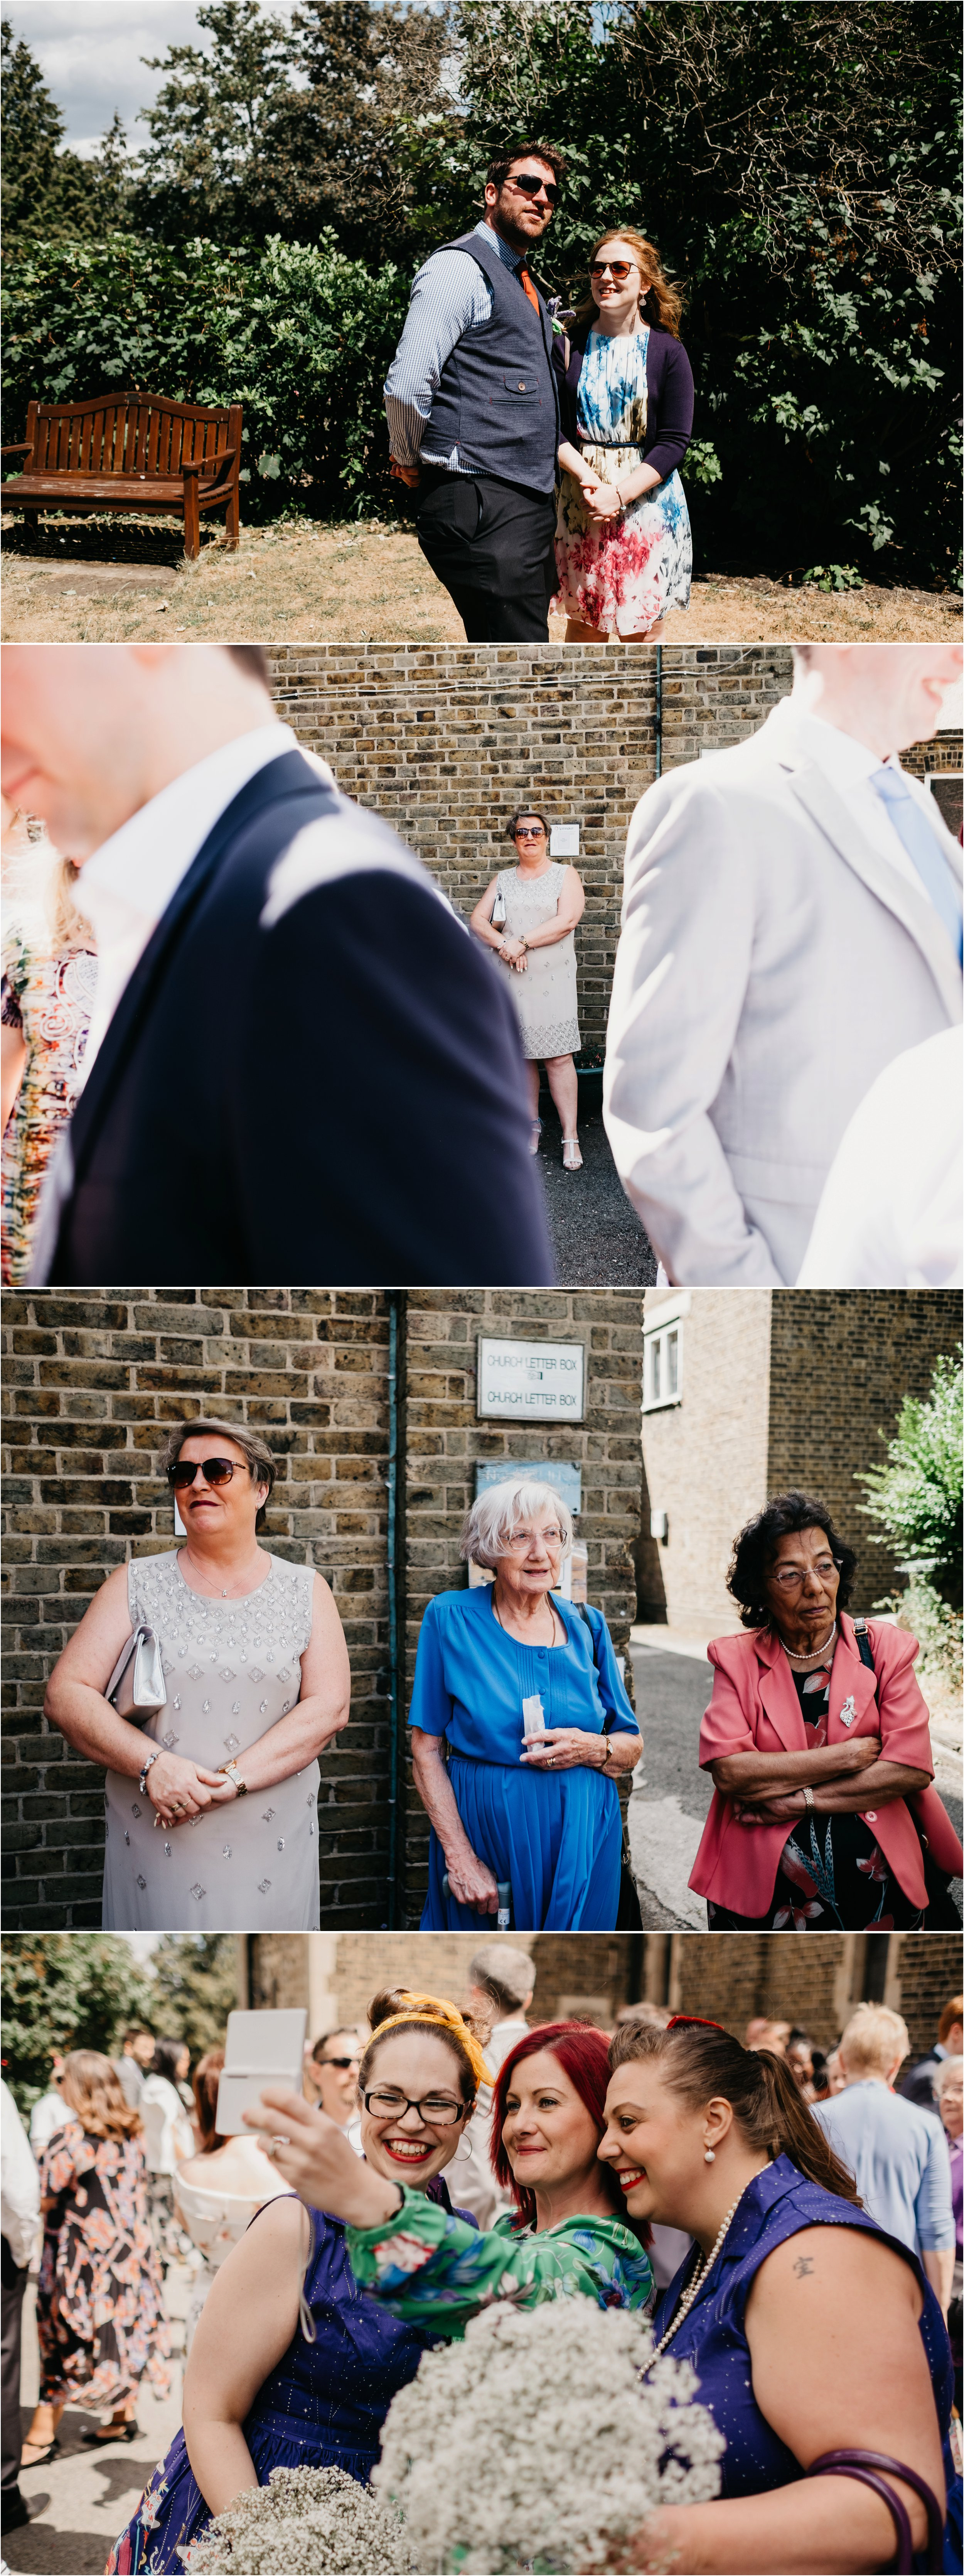 London wedding photography_0053.jpg